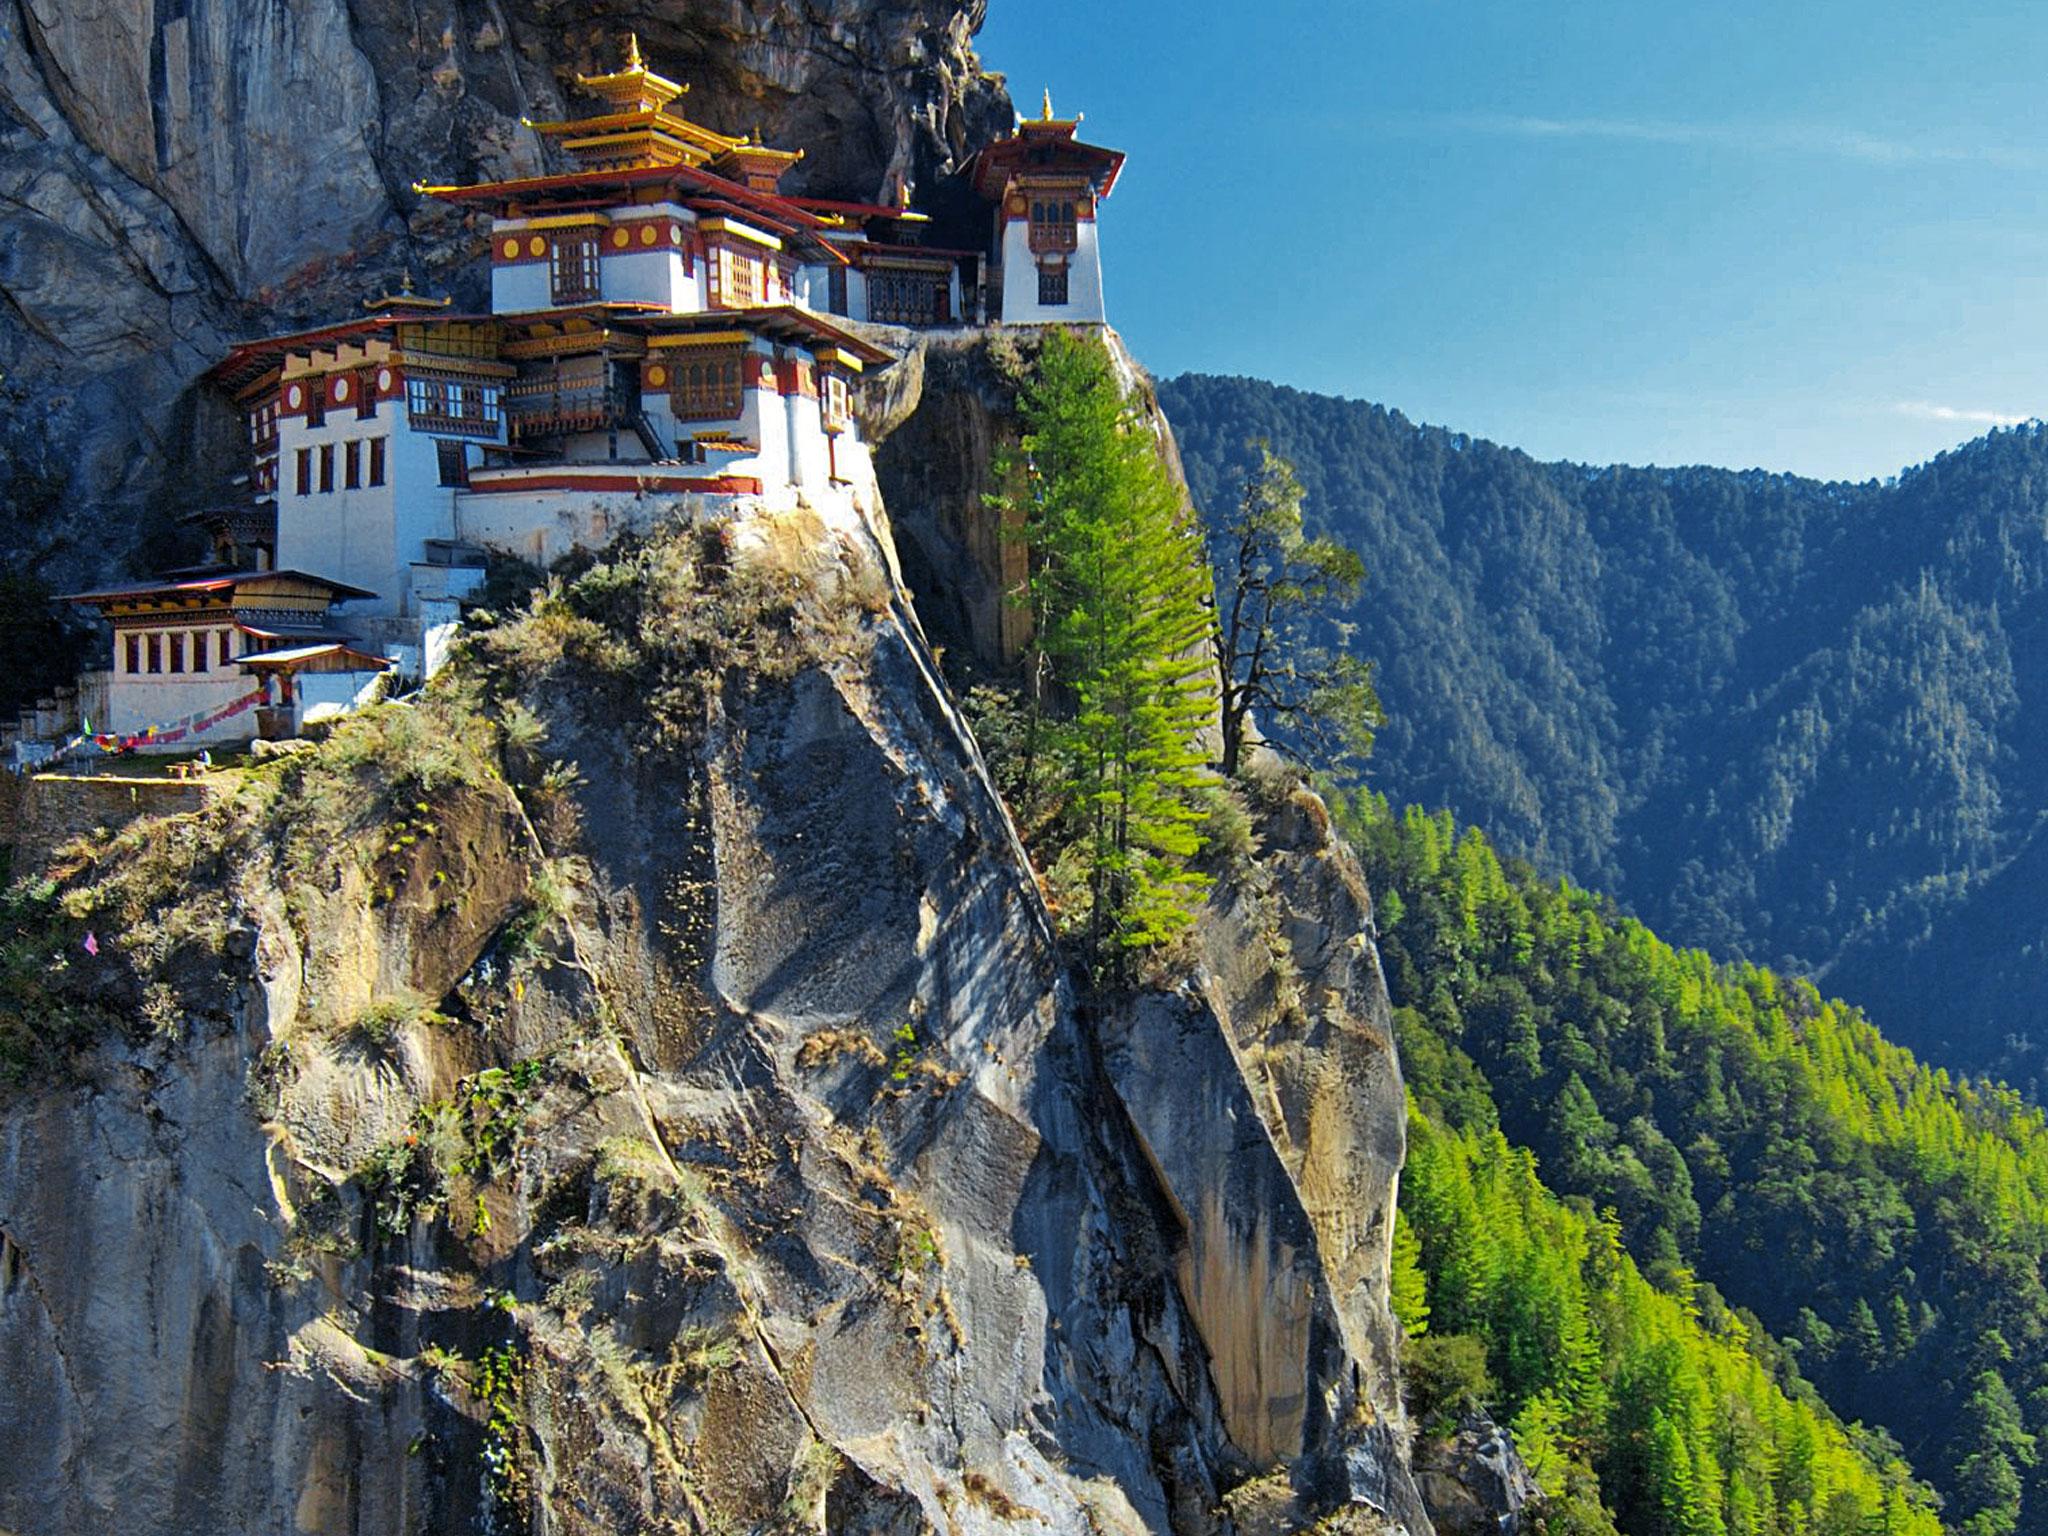 Photo Credit  http://allworldtowns.com/countries/bhutan.html